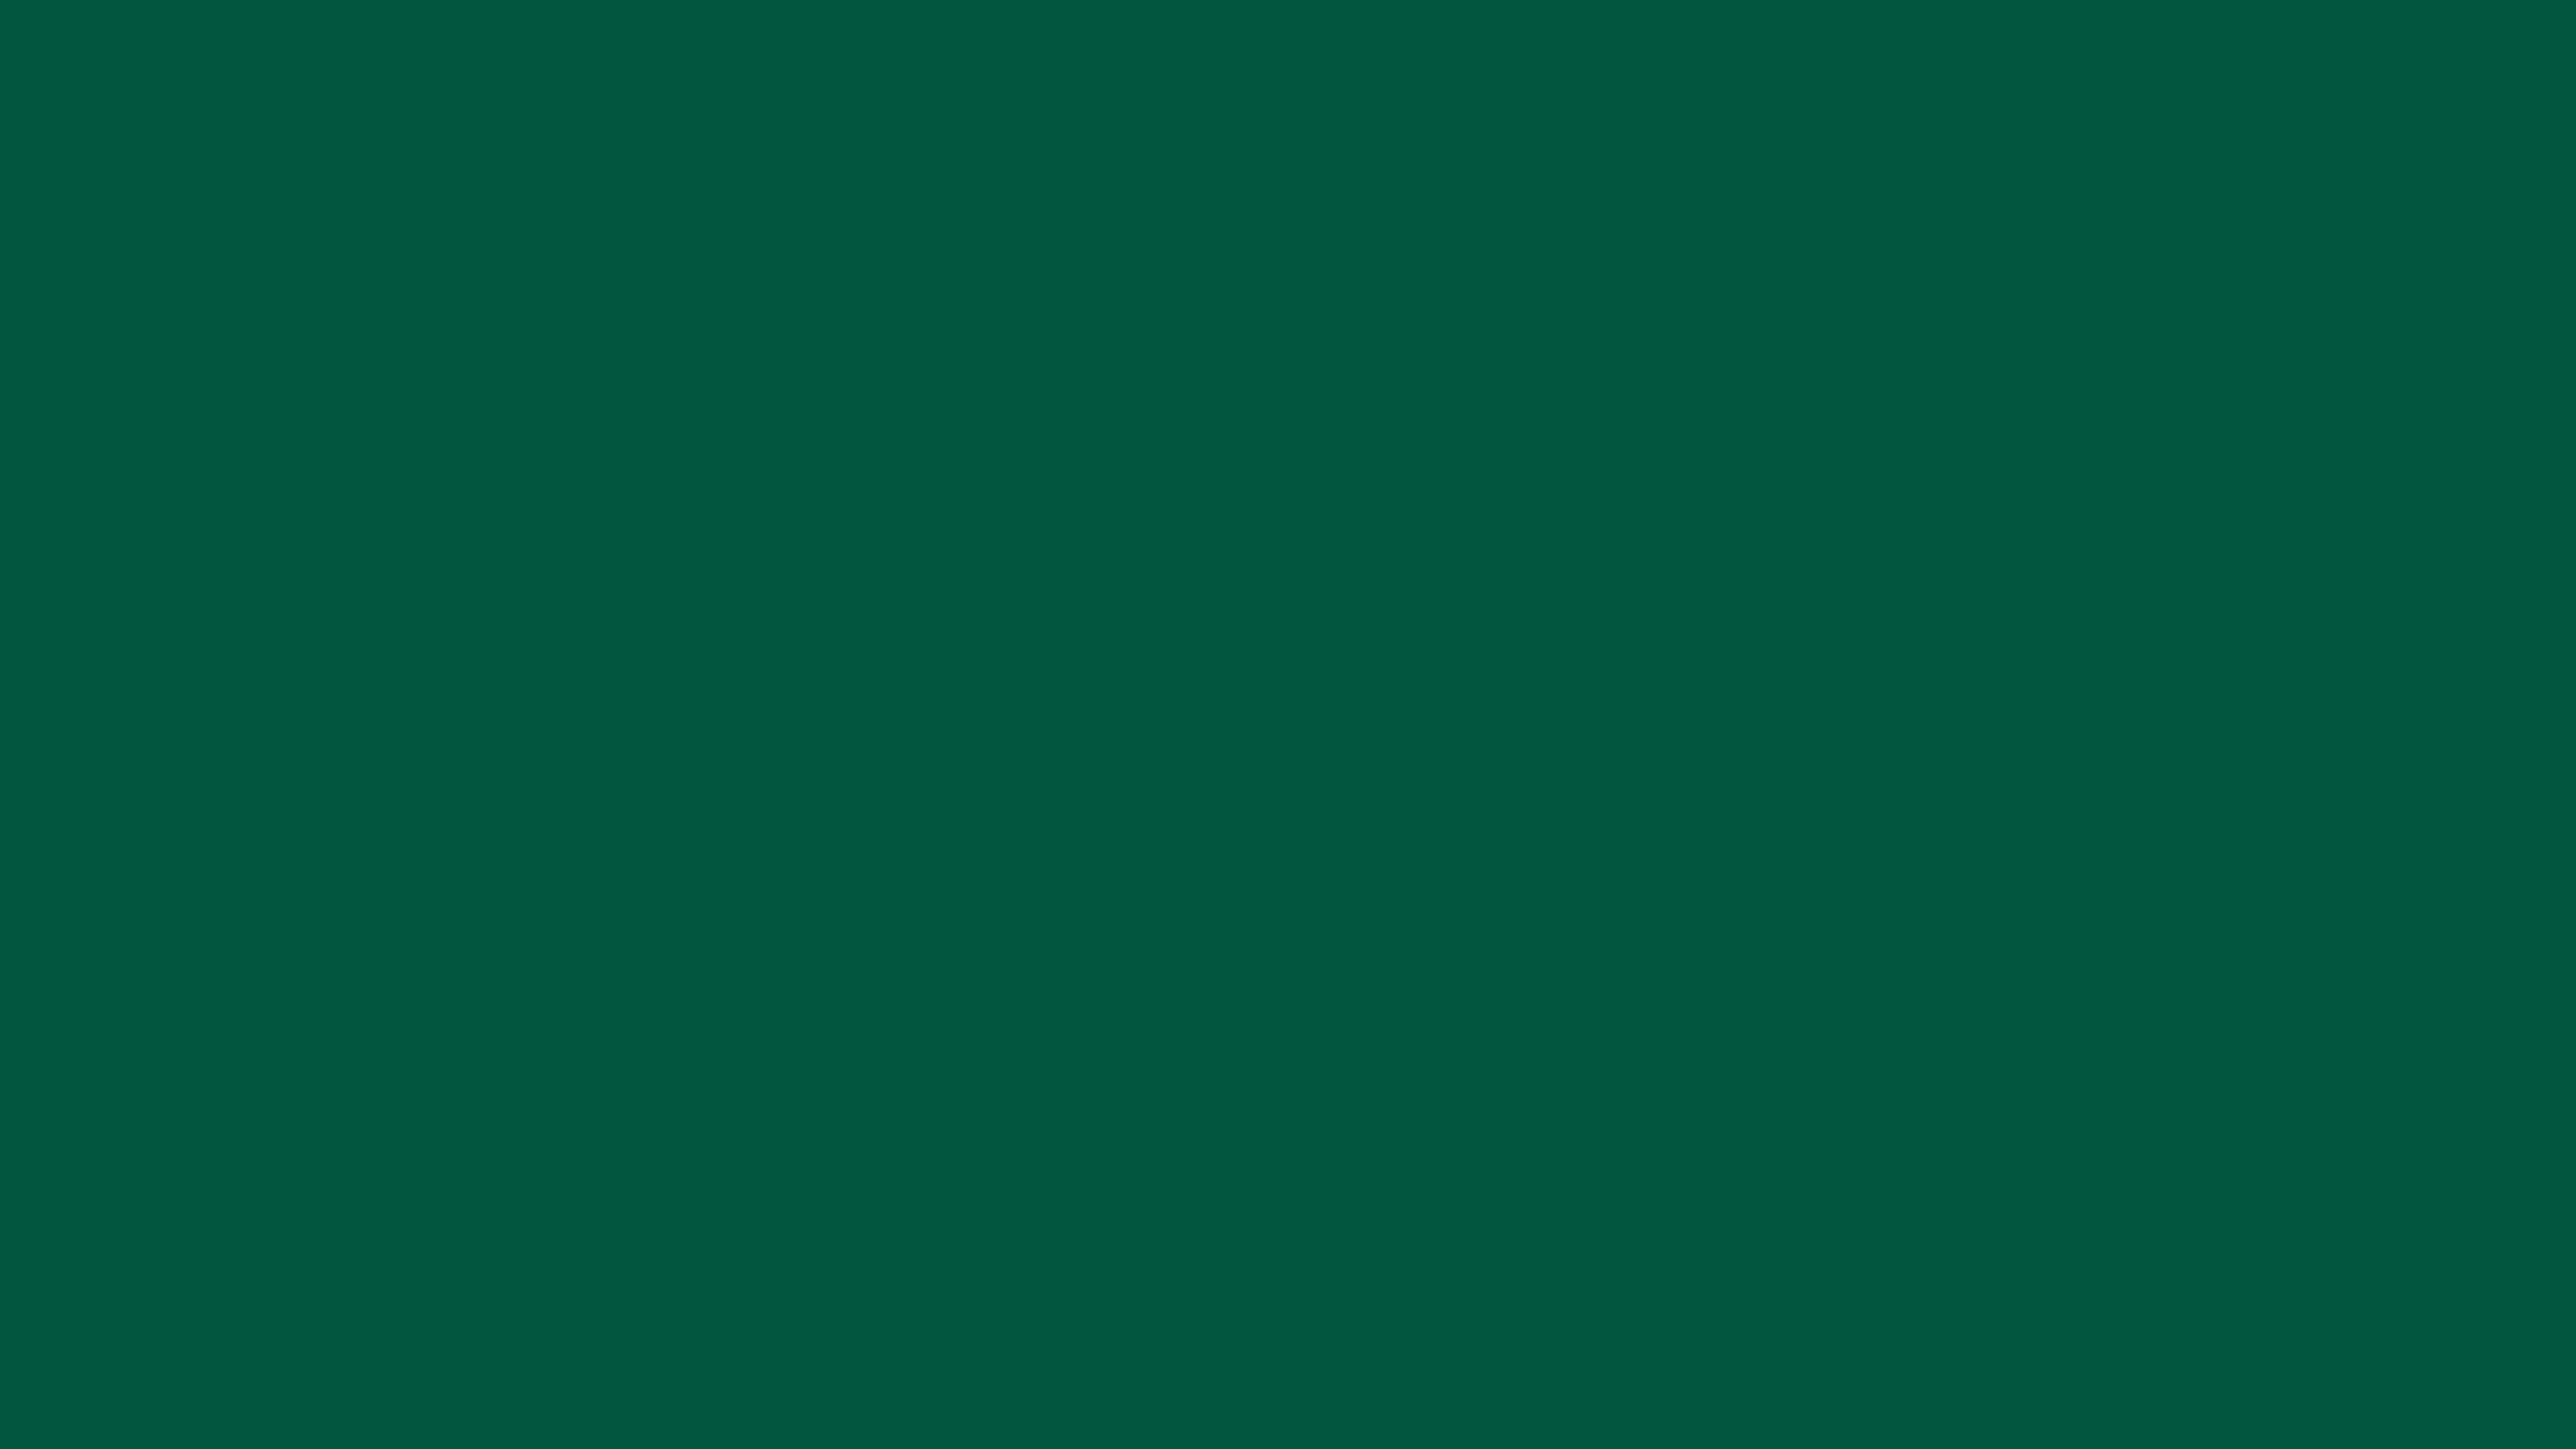 3840x2160 Castleton Green Solid Color Background